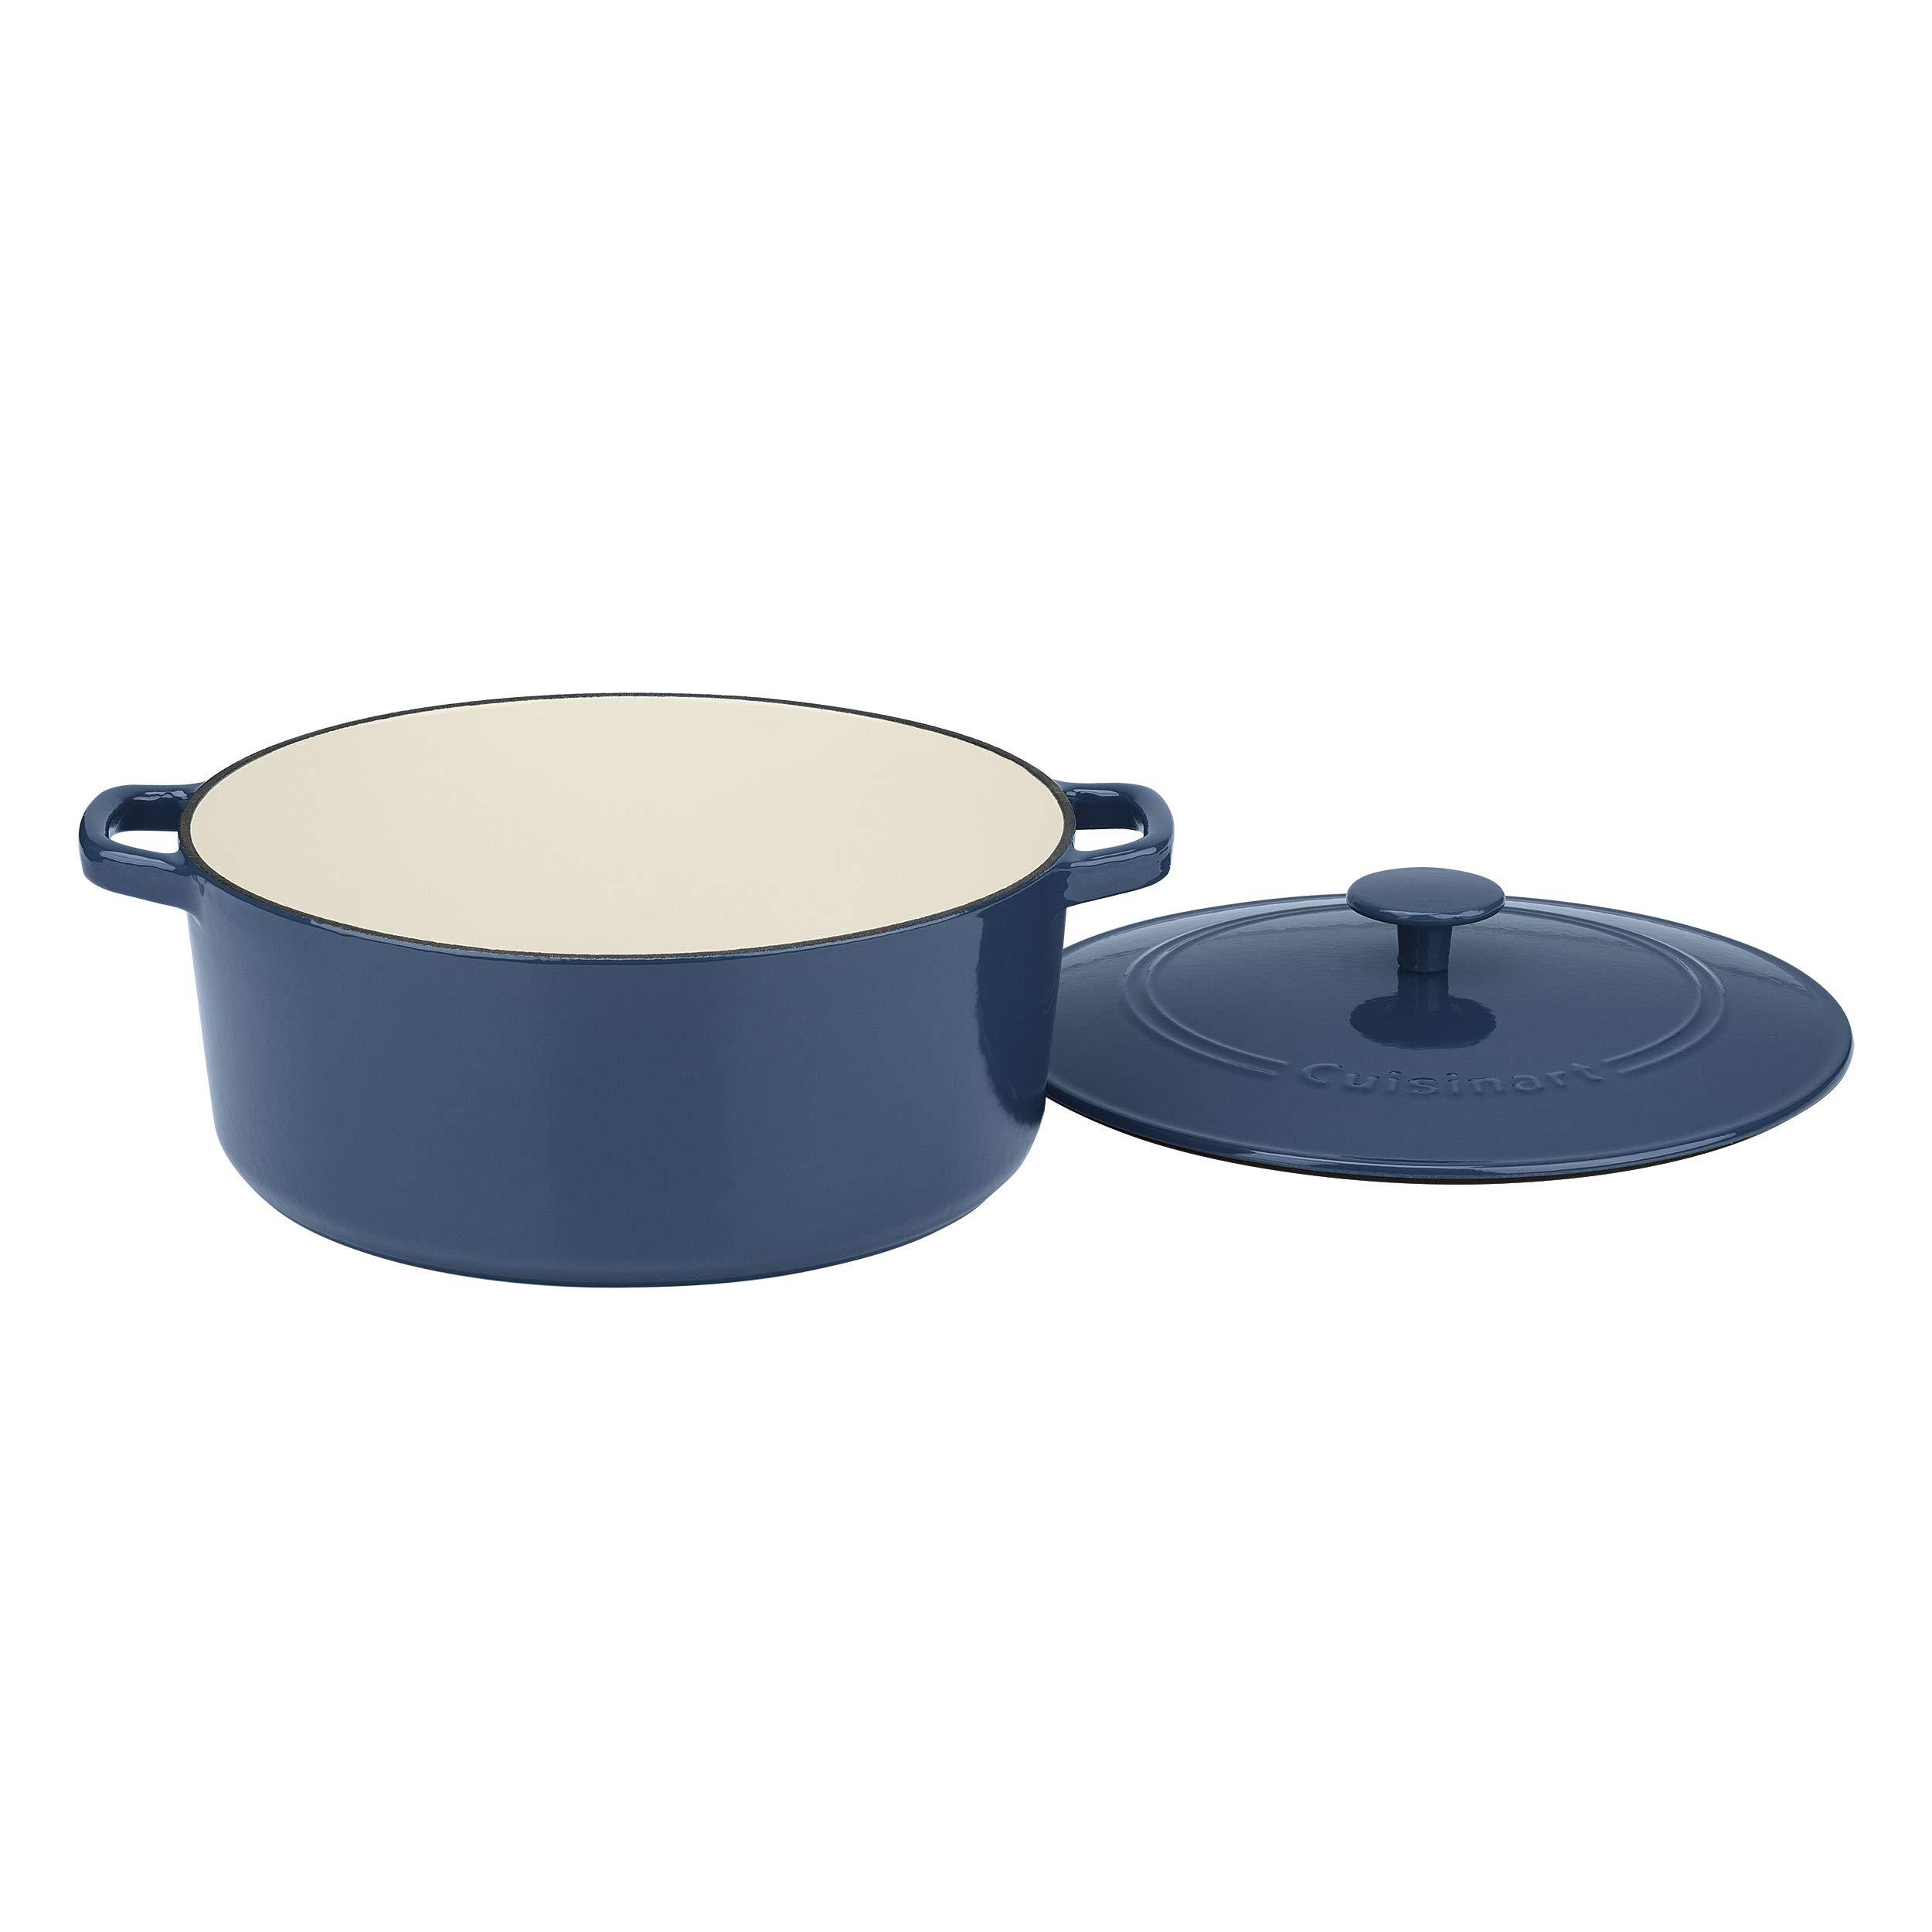 CUISINART CI30-23BG Chefs Classic Enameled Cast Iron 9-1//4 Square Grill Pan Provencal Blue